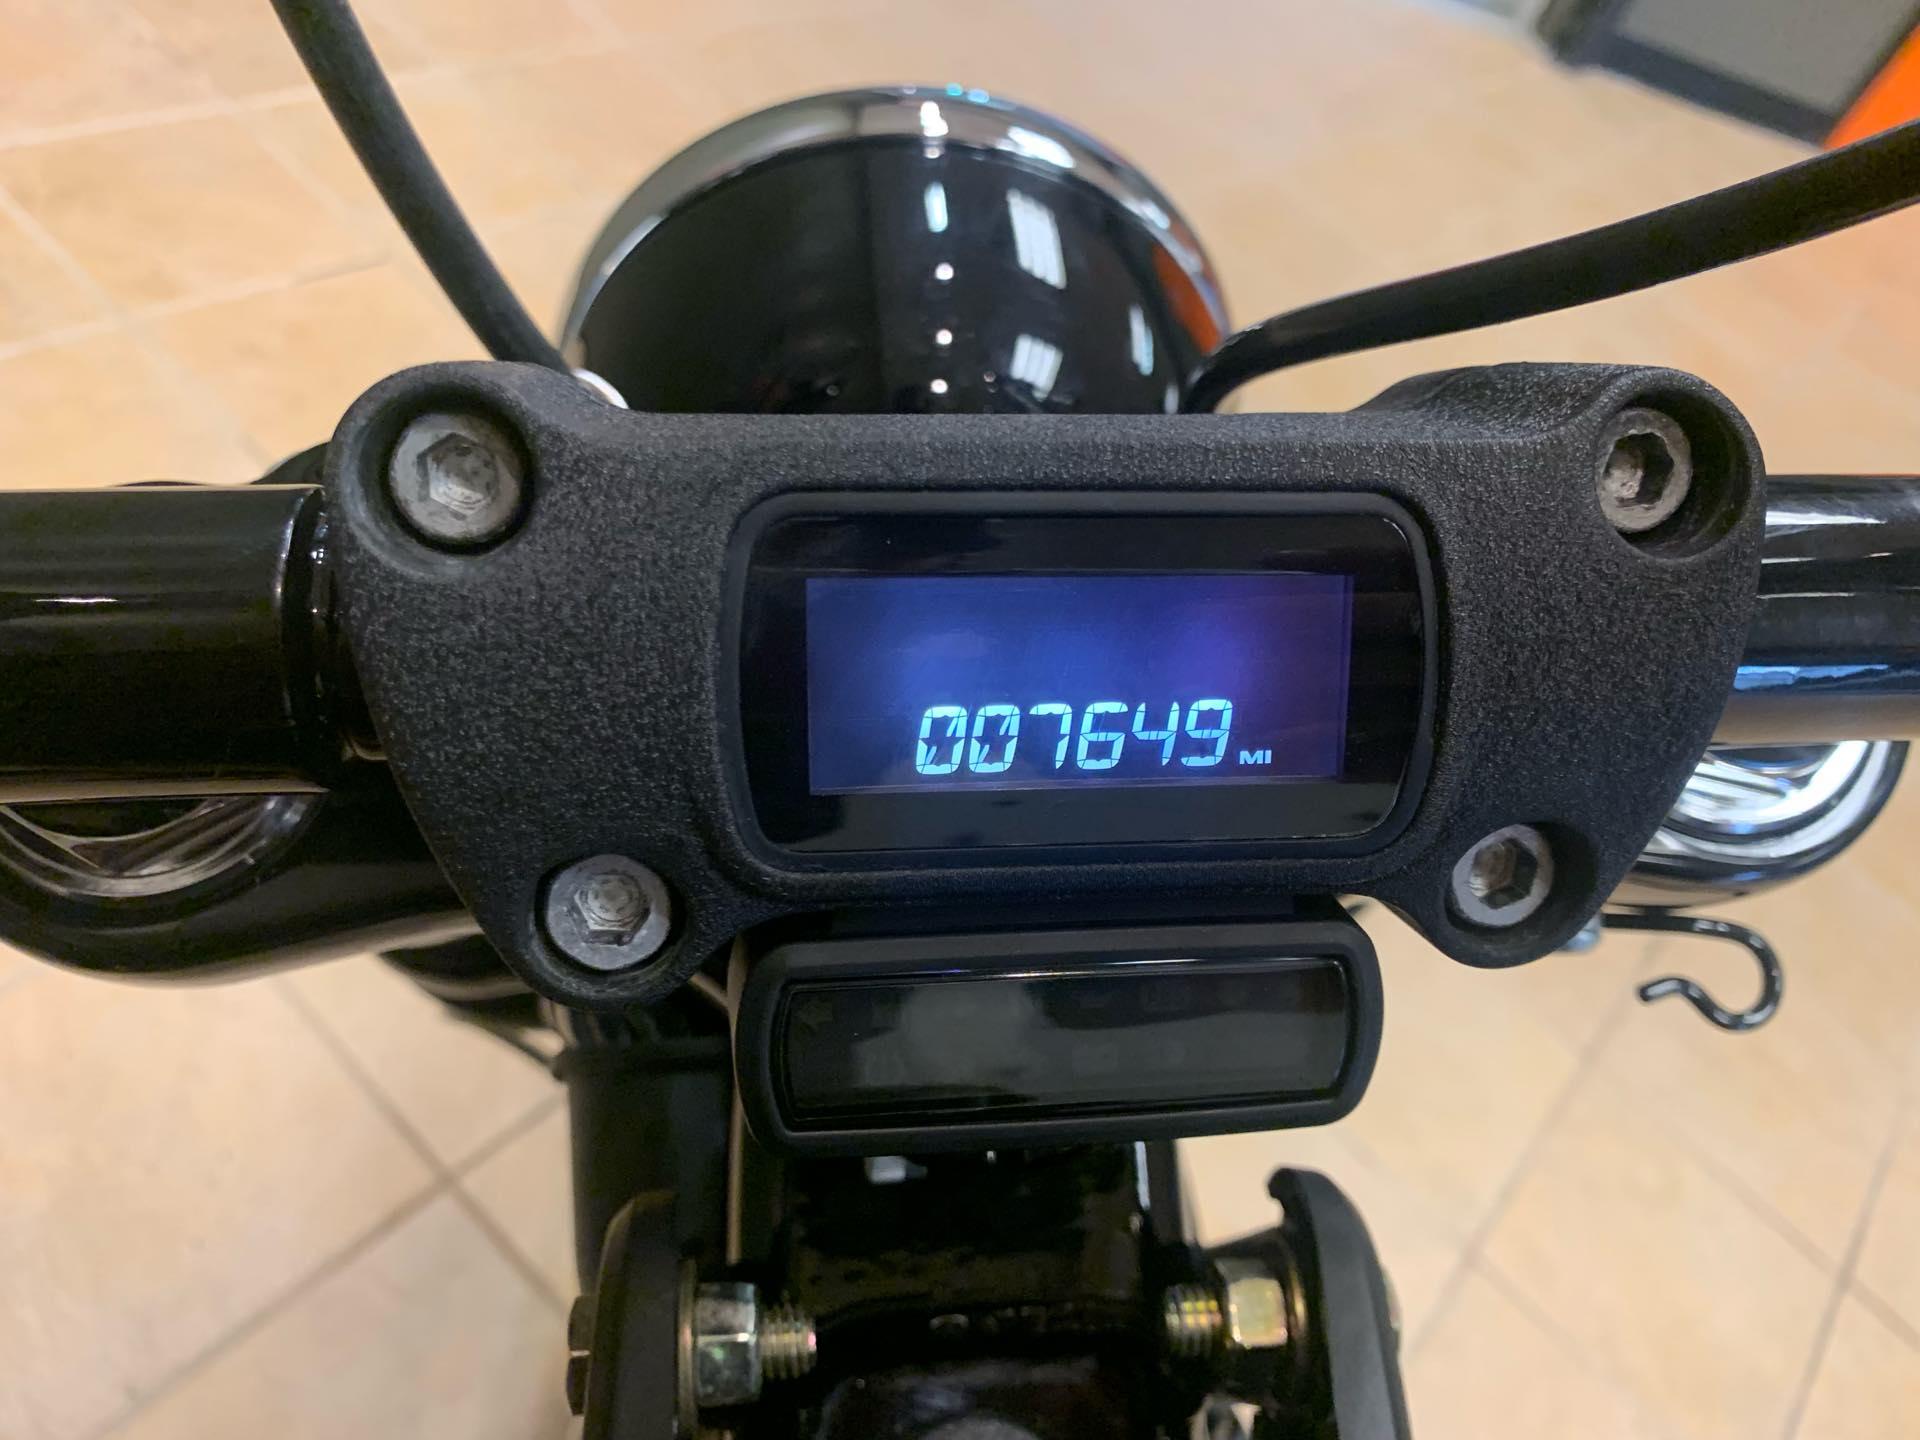 2019 Harley-Davidson Softail Street Bob at Loess Hills Harley-Davidson